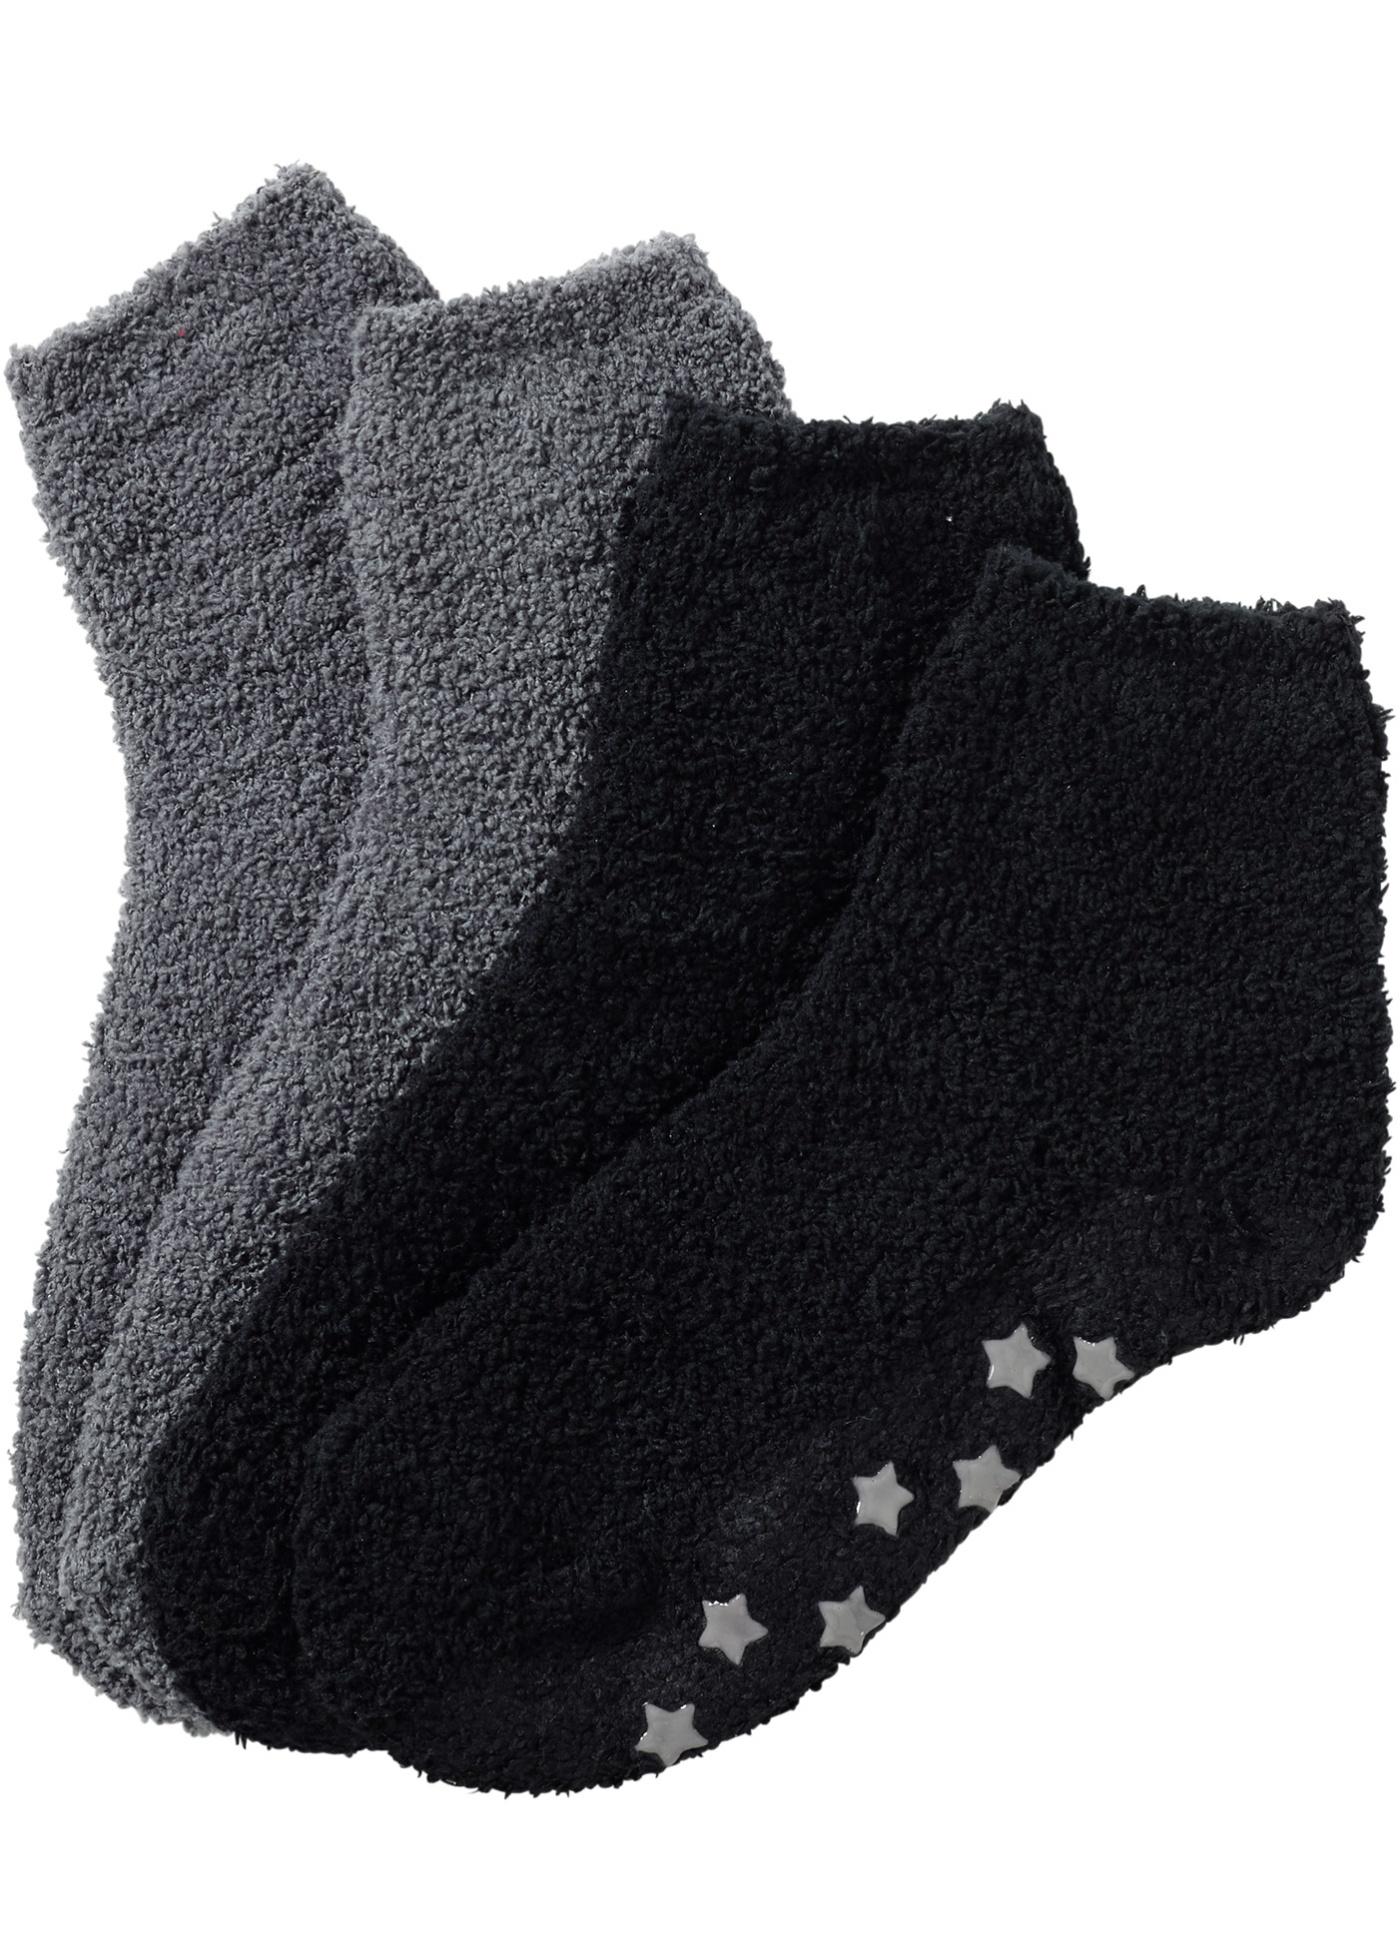 Myssockor (2-pack), bpc bonprix collection, svart/rökgrå